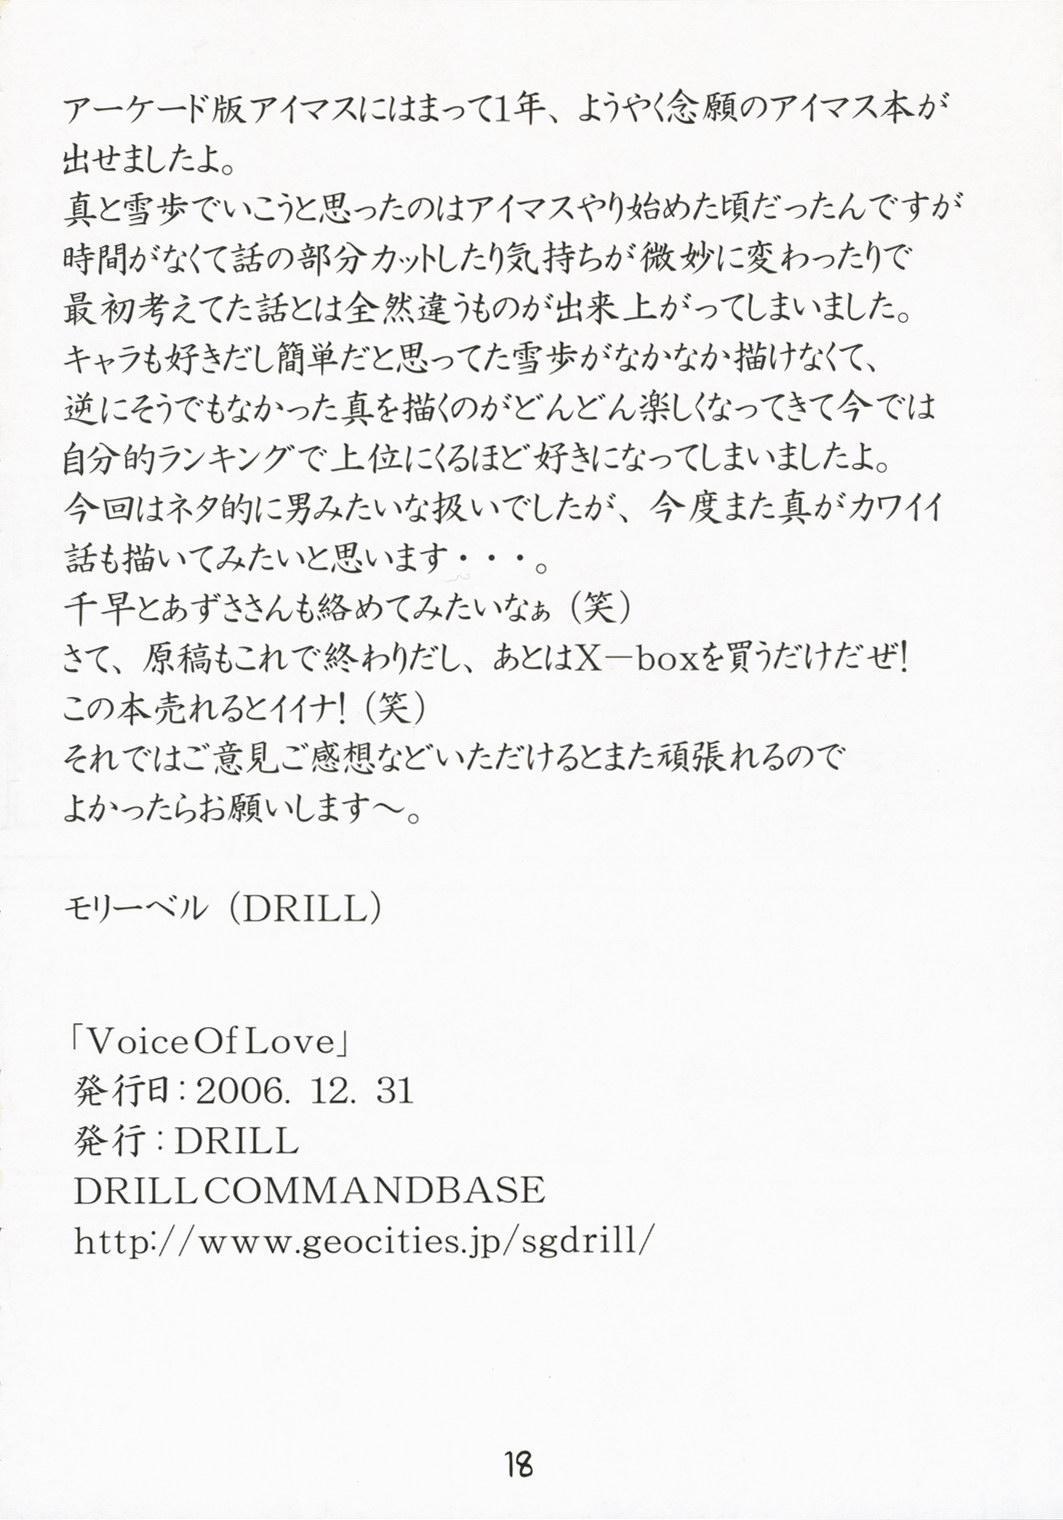 Voice of Love 16